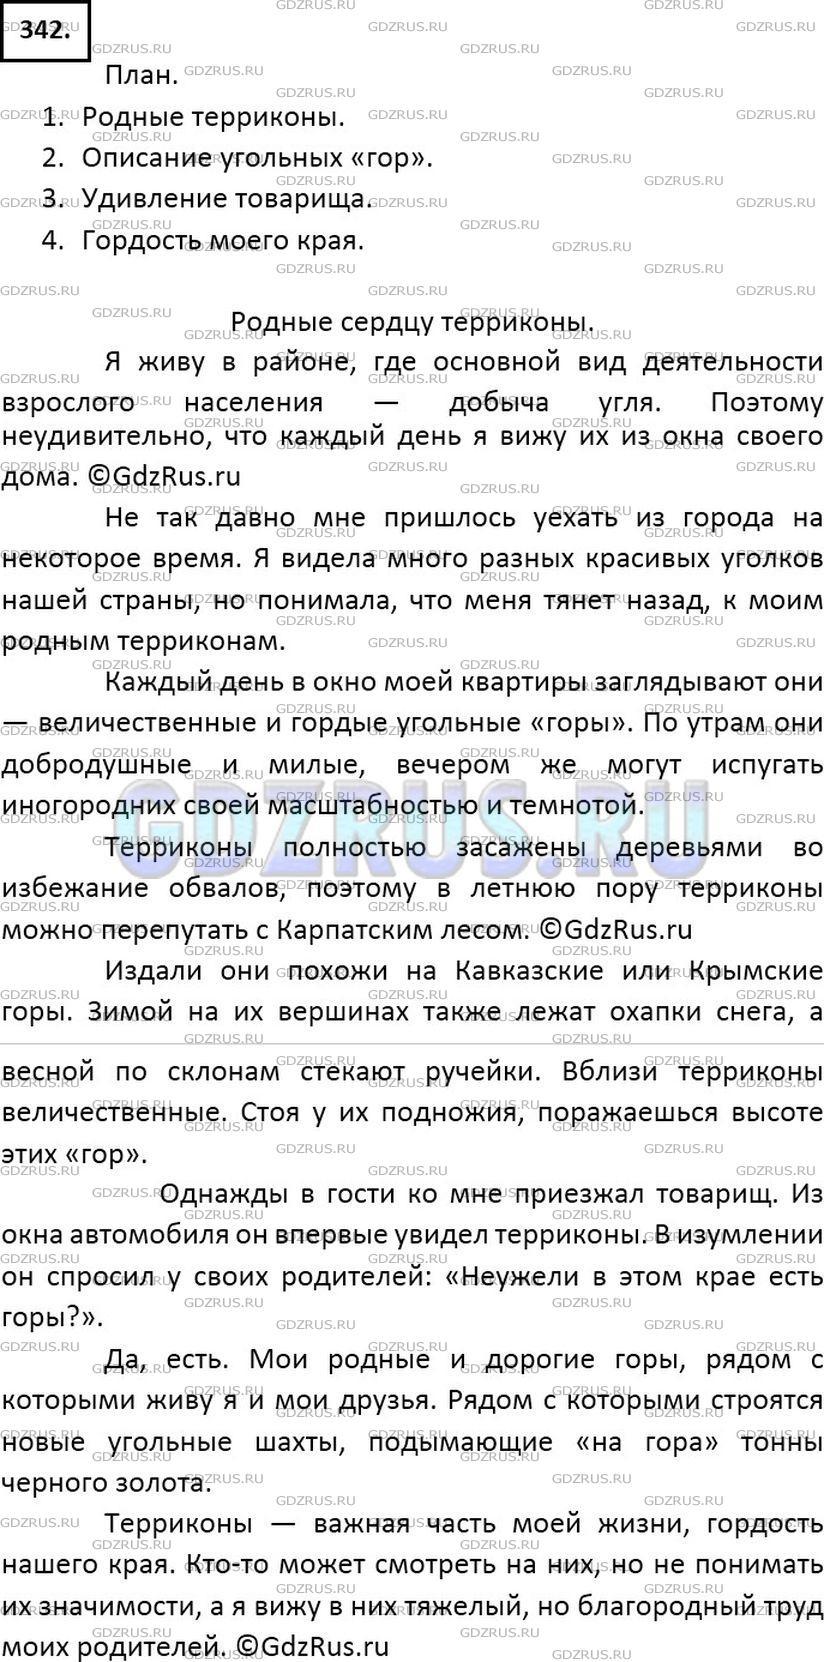 гдз по русскому языку 6 класс 185